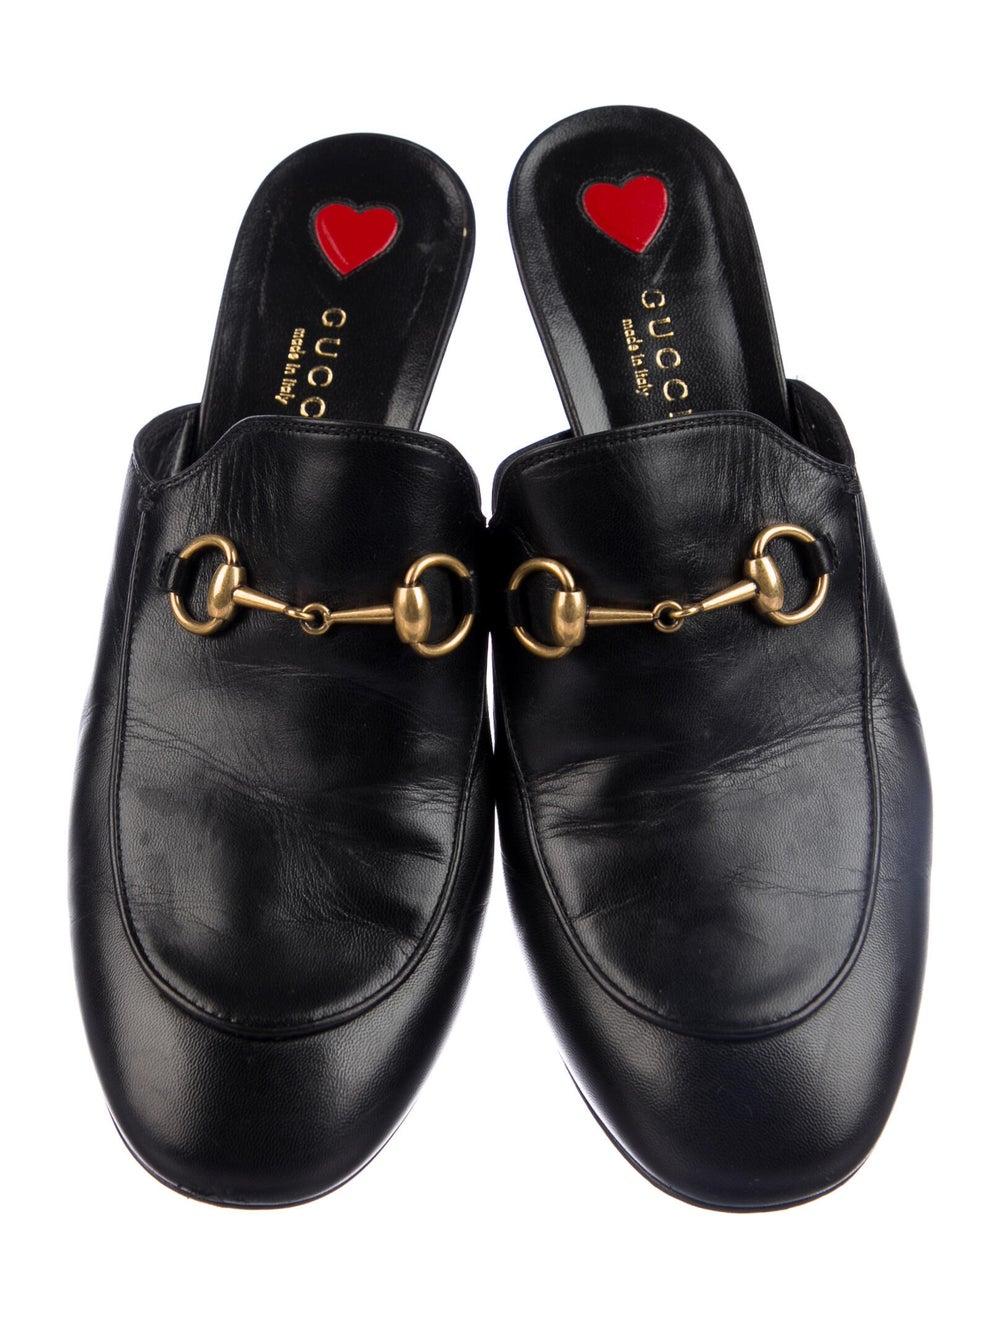 Gucci 1955 Horsebit Accent Leather Mules Black - image 3